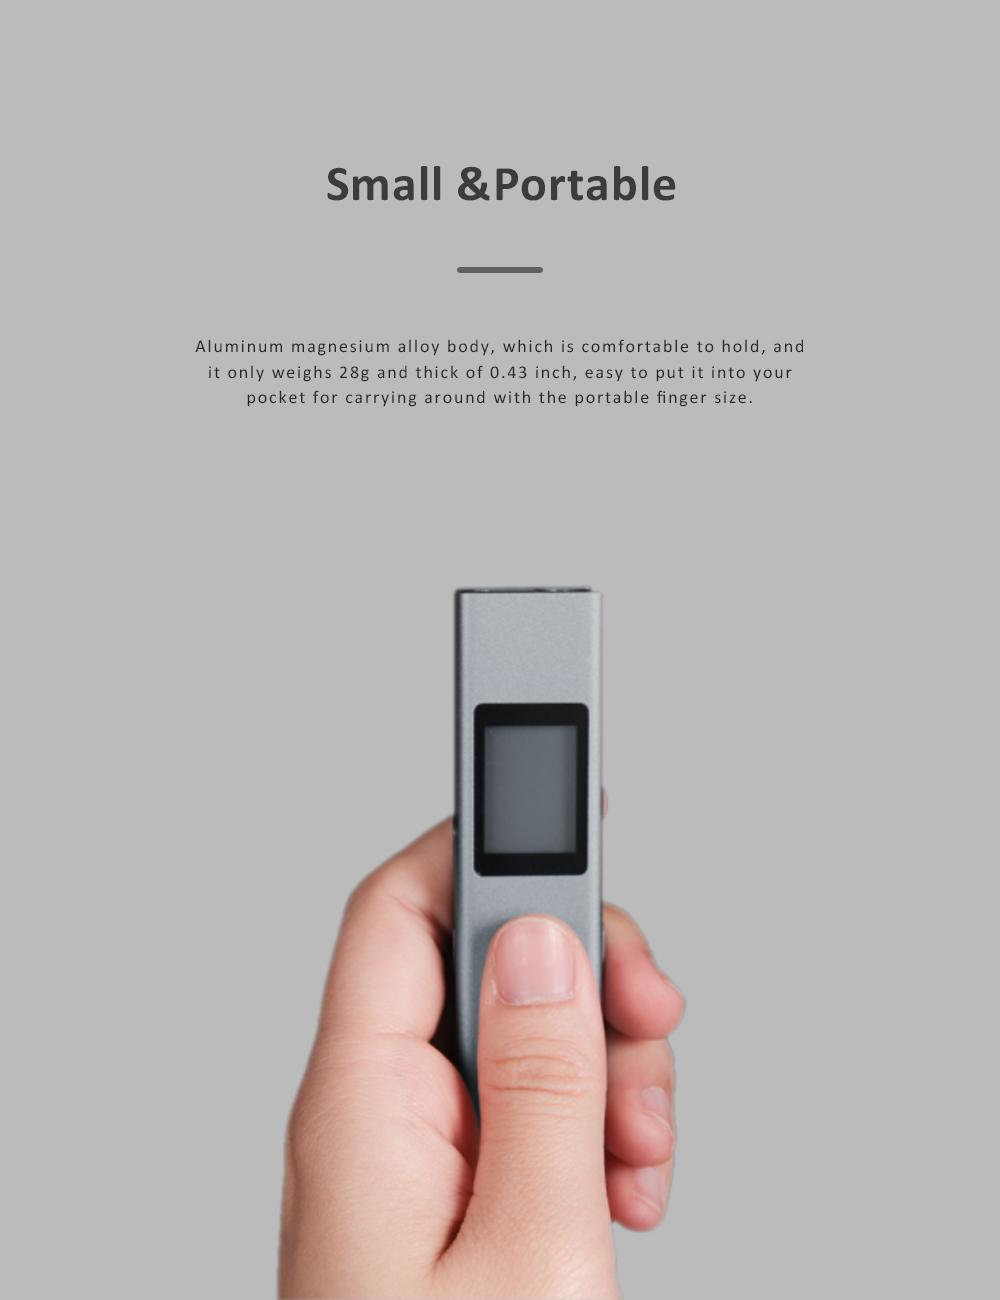 Xiaomi DUKA LS-P Laser Distance Rangefinder Mini Hand-held Digital Distance Meter with 200mAh Battery for Distance Area Volume Measurement 1